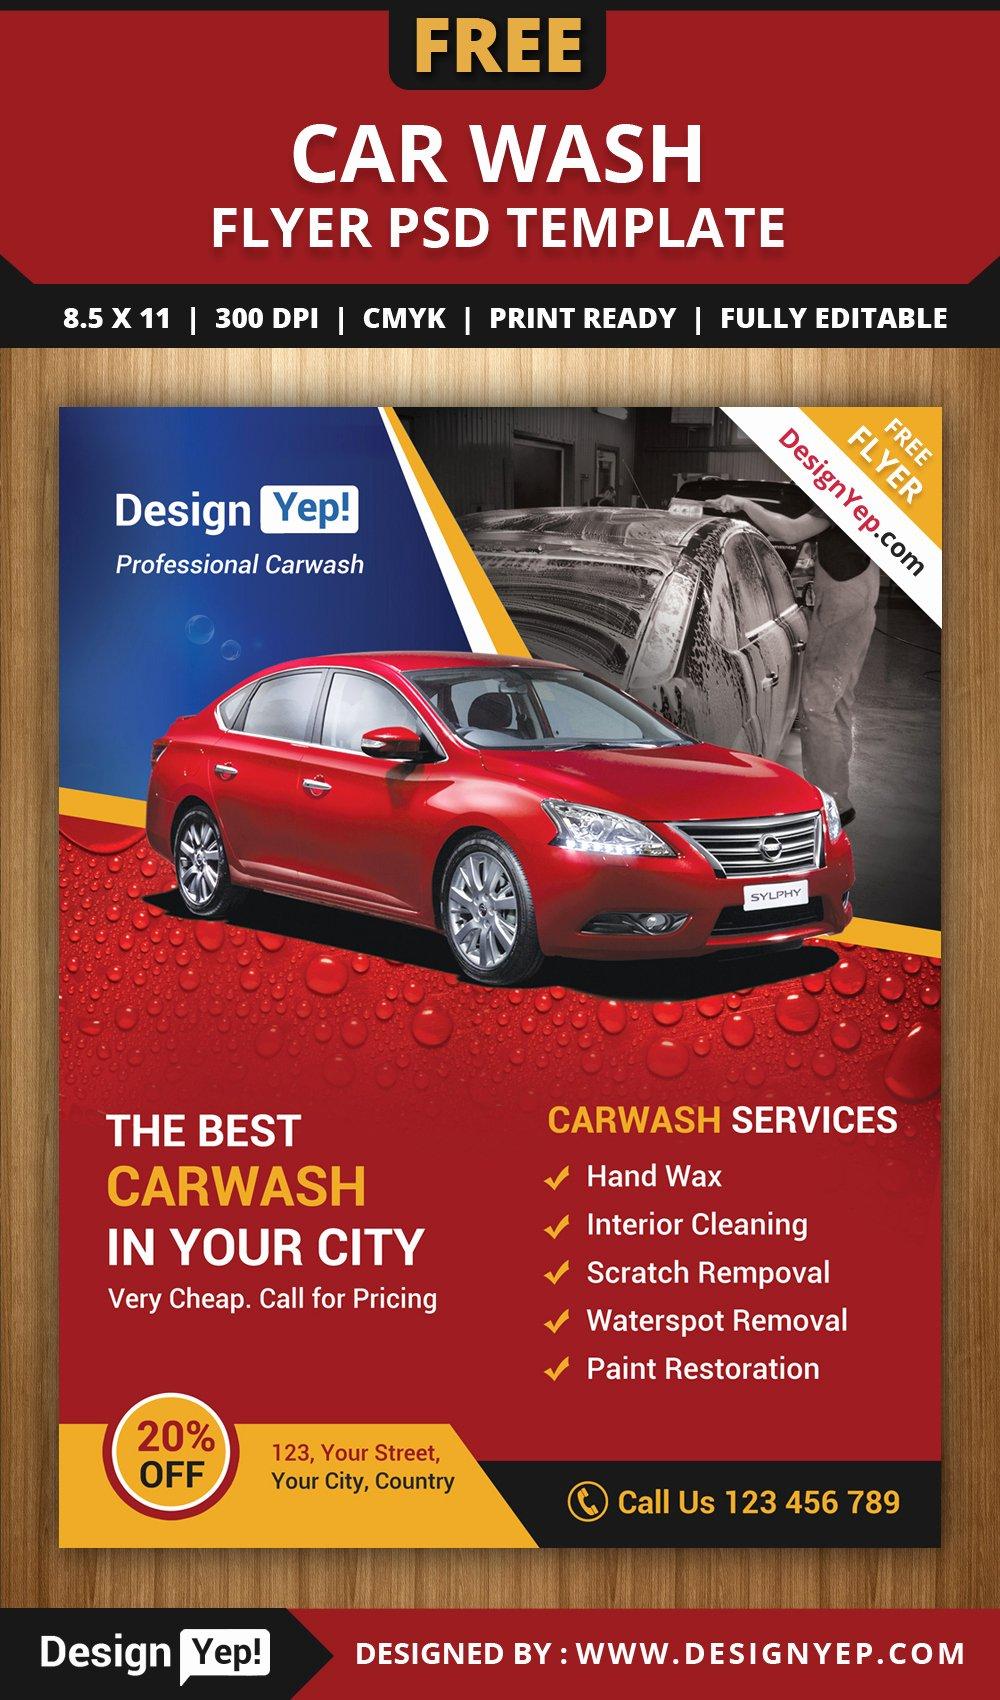 Car Wash Flyer Template Inspirational Free Car Wash Flyer Psd Template Designyep